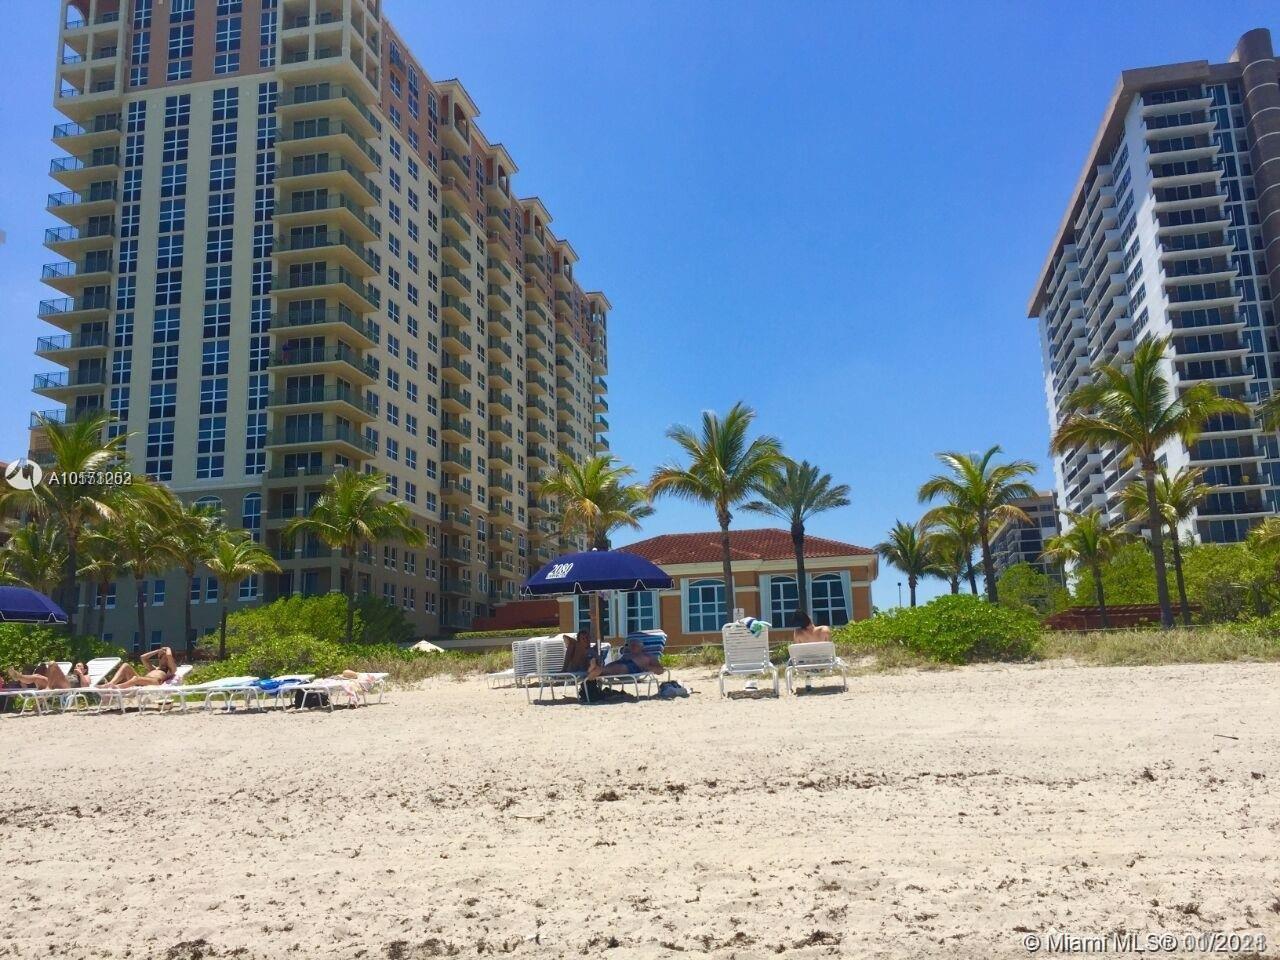 2080 Hallandale #303 - 2080 S Ocean Dr #303, Hallandale Beach, FL 33009